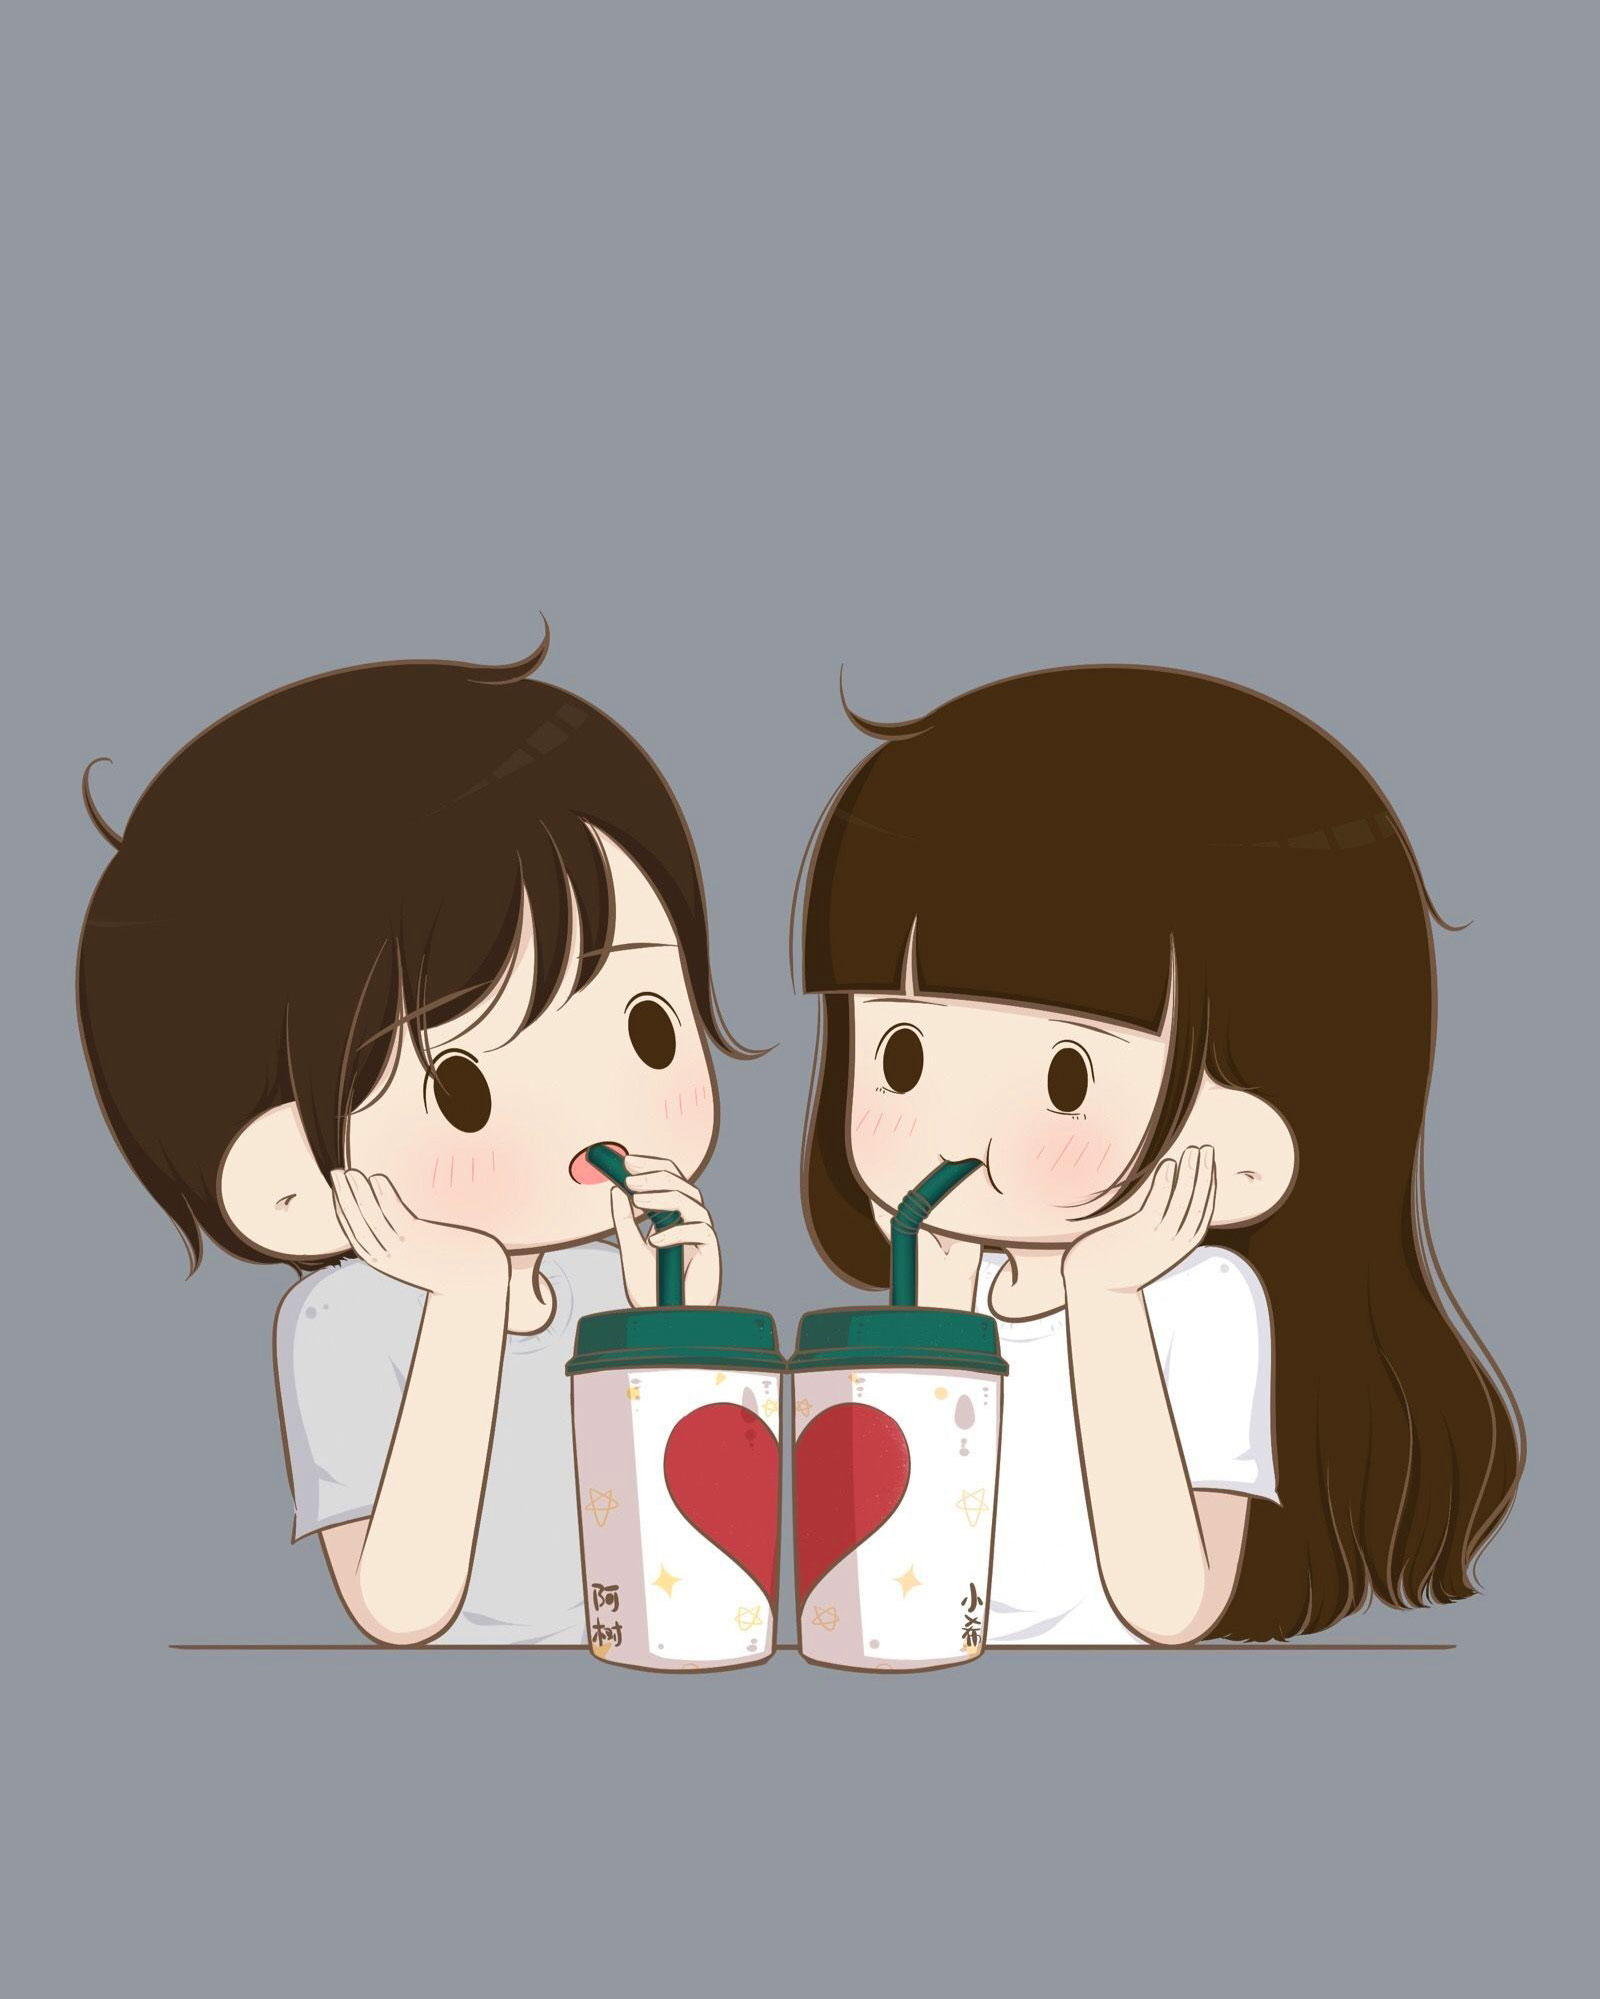 Cute Couple Images wallpaper